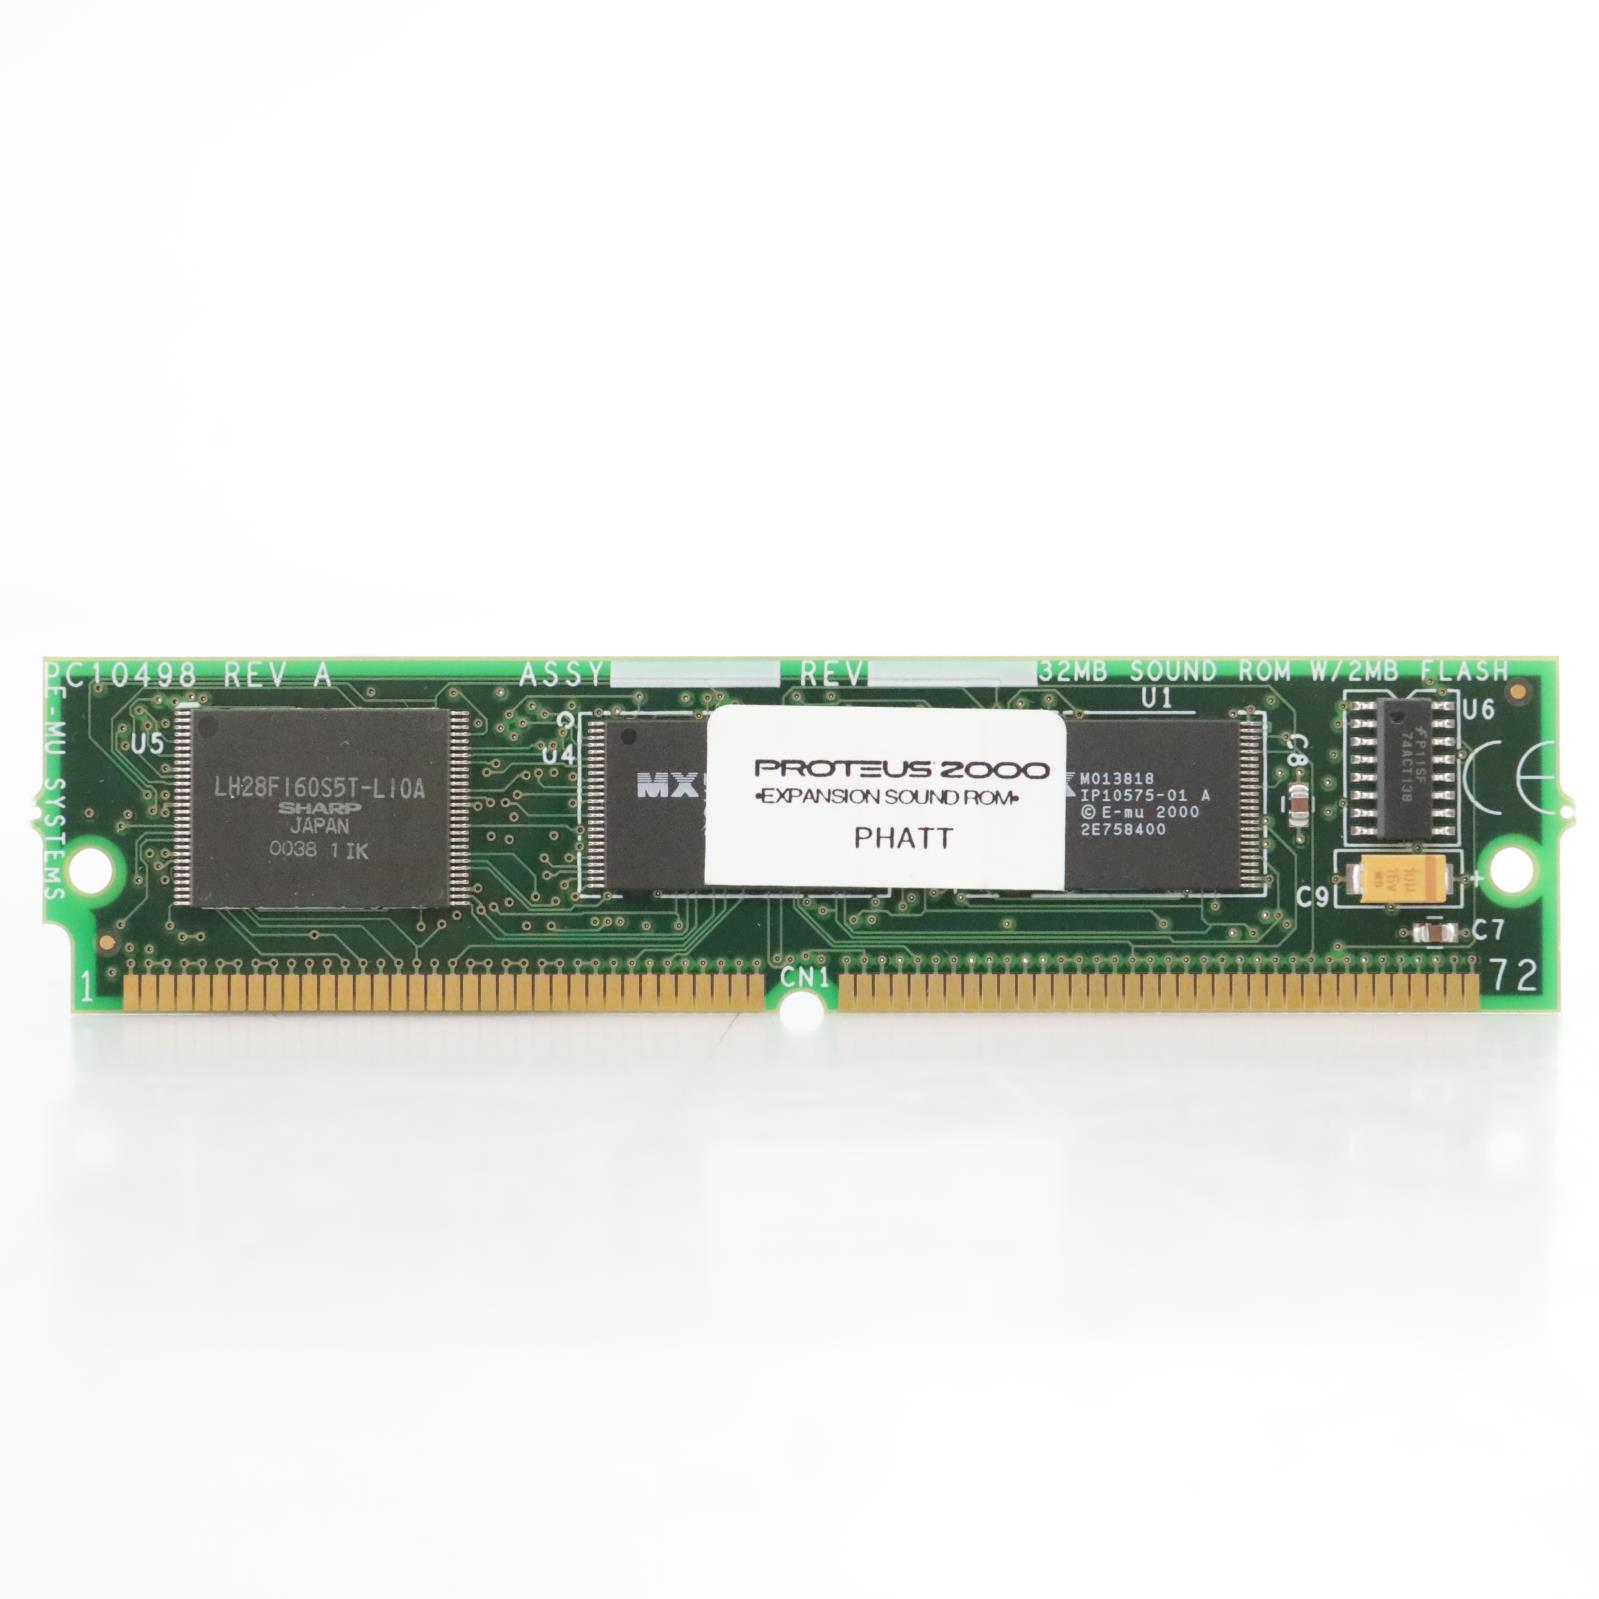 E-MU Proteus 2000 Phatt 32mb Expansion ROM Card #45007